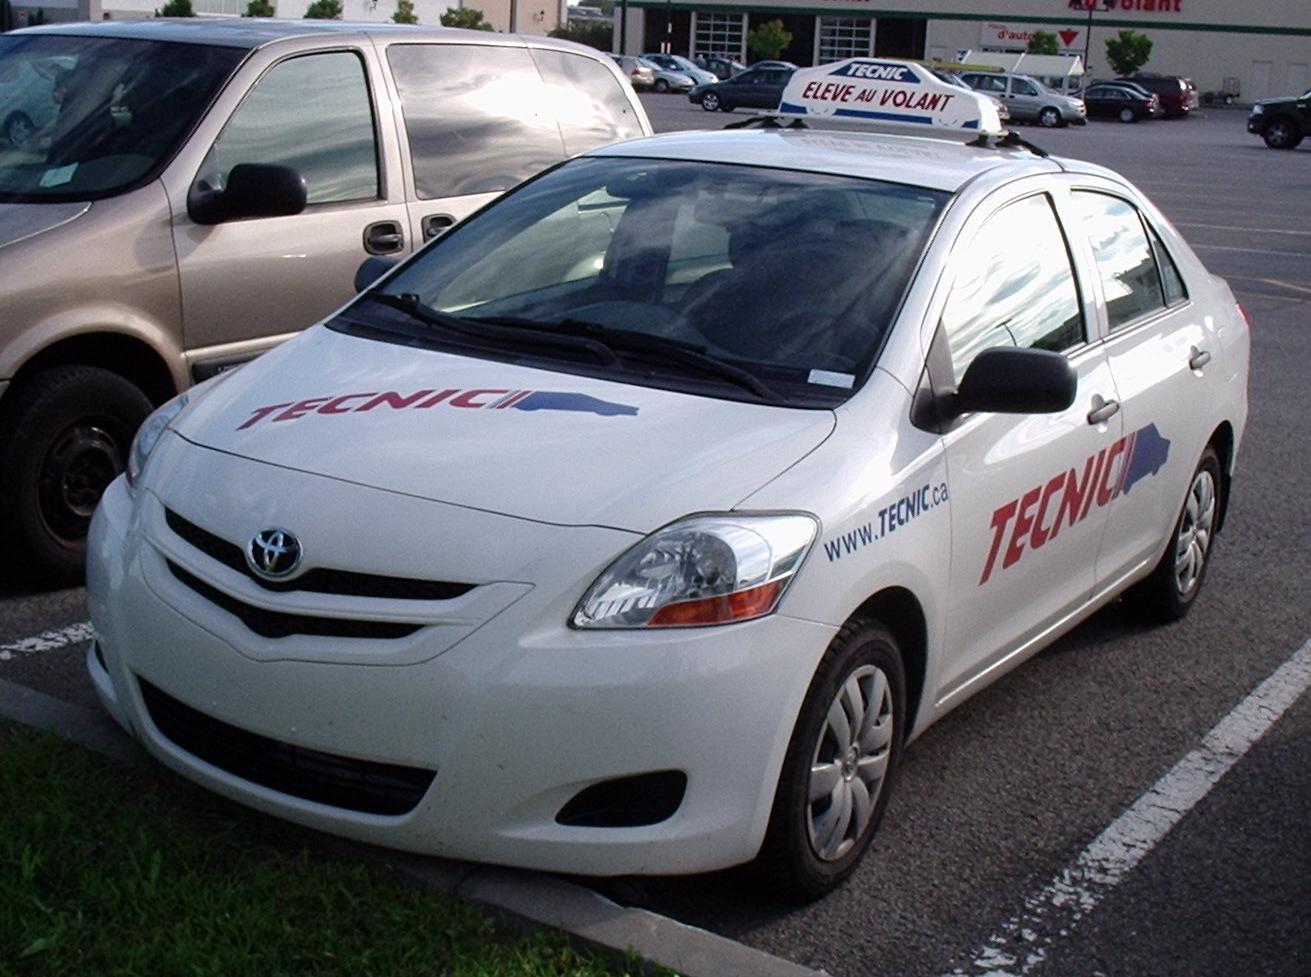 Toyota Yaris Driving School Car Llandudno